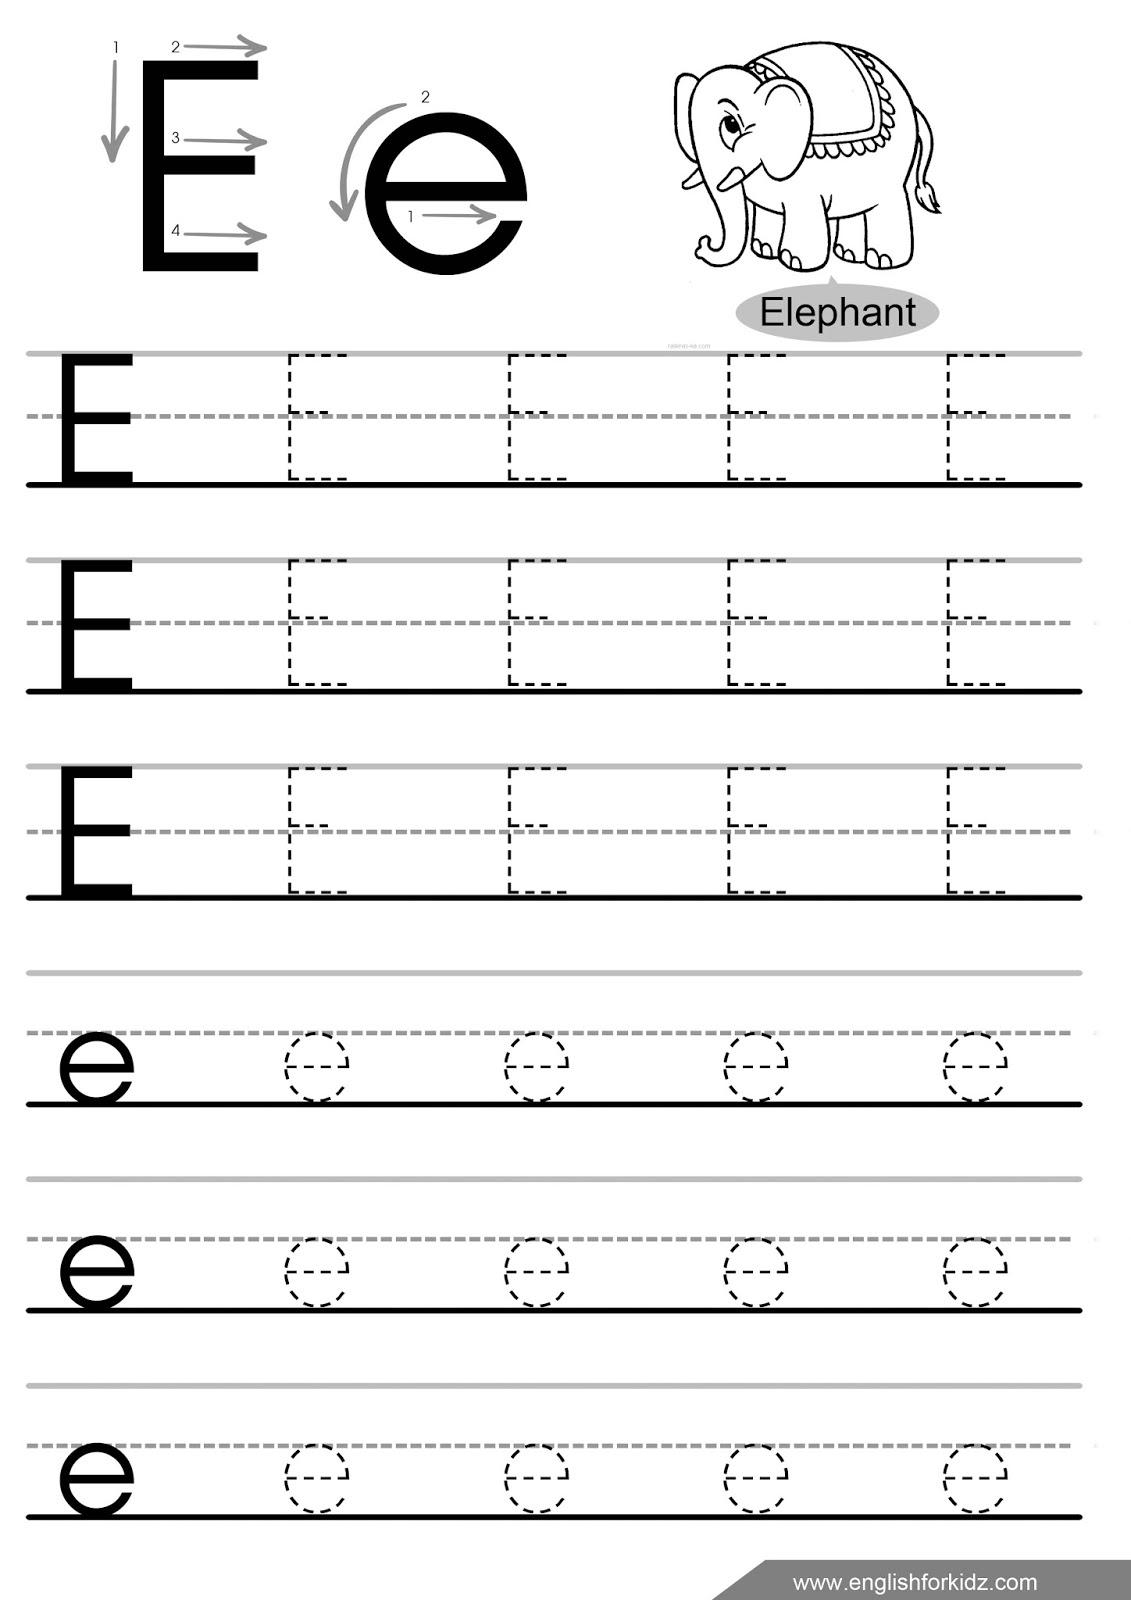 Letter E Tracing Worksheets Preschool The Best Worksheets Image